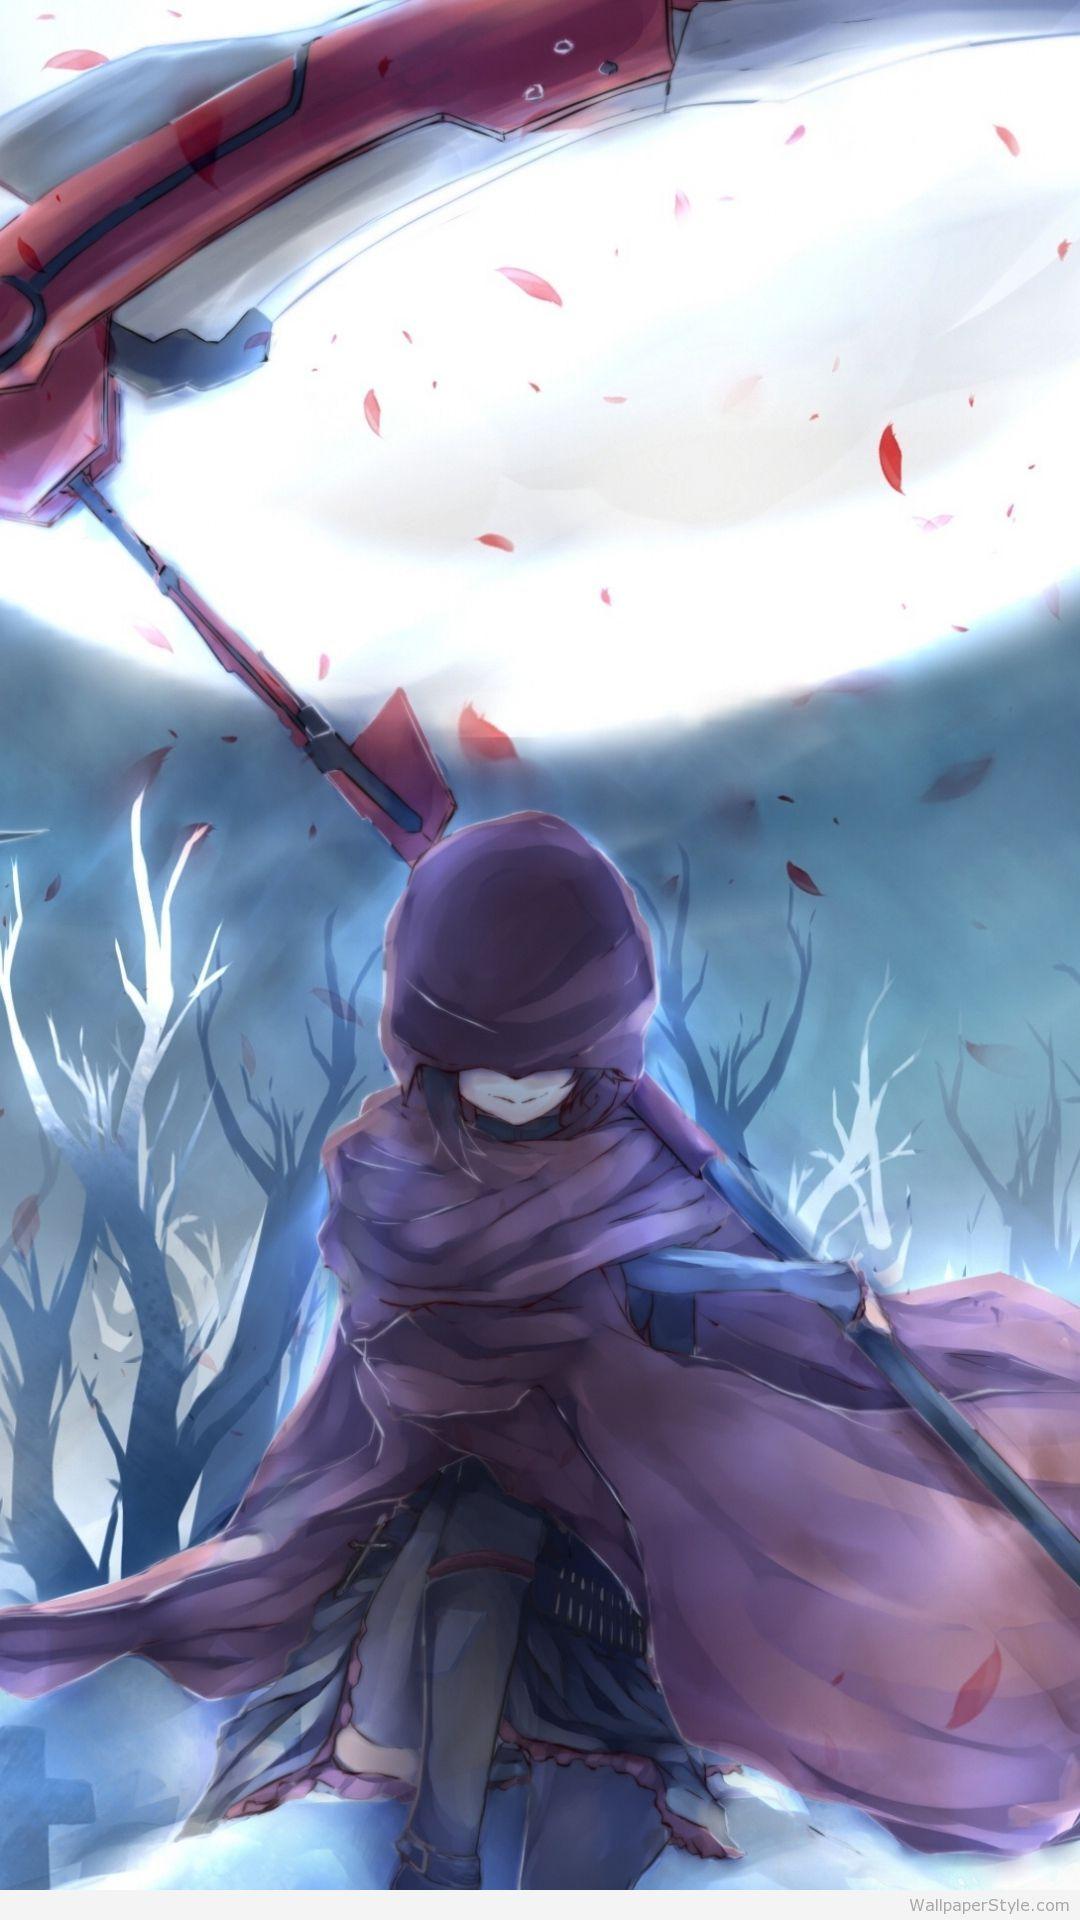 Anime Wallpapers, HD Desktop Backgrounds - WallpaperMaiden